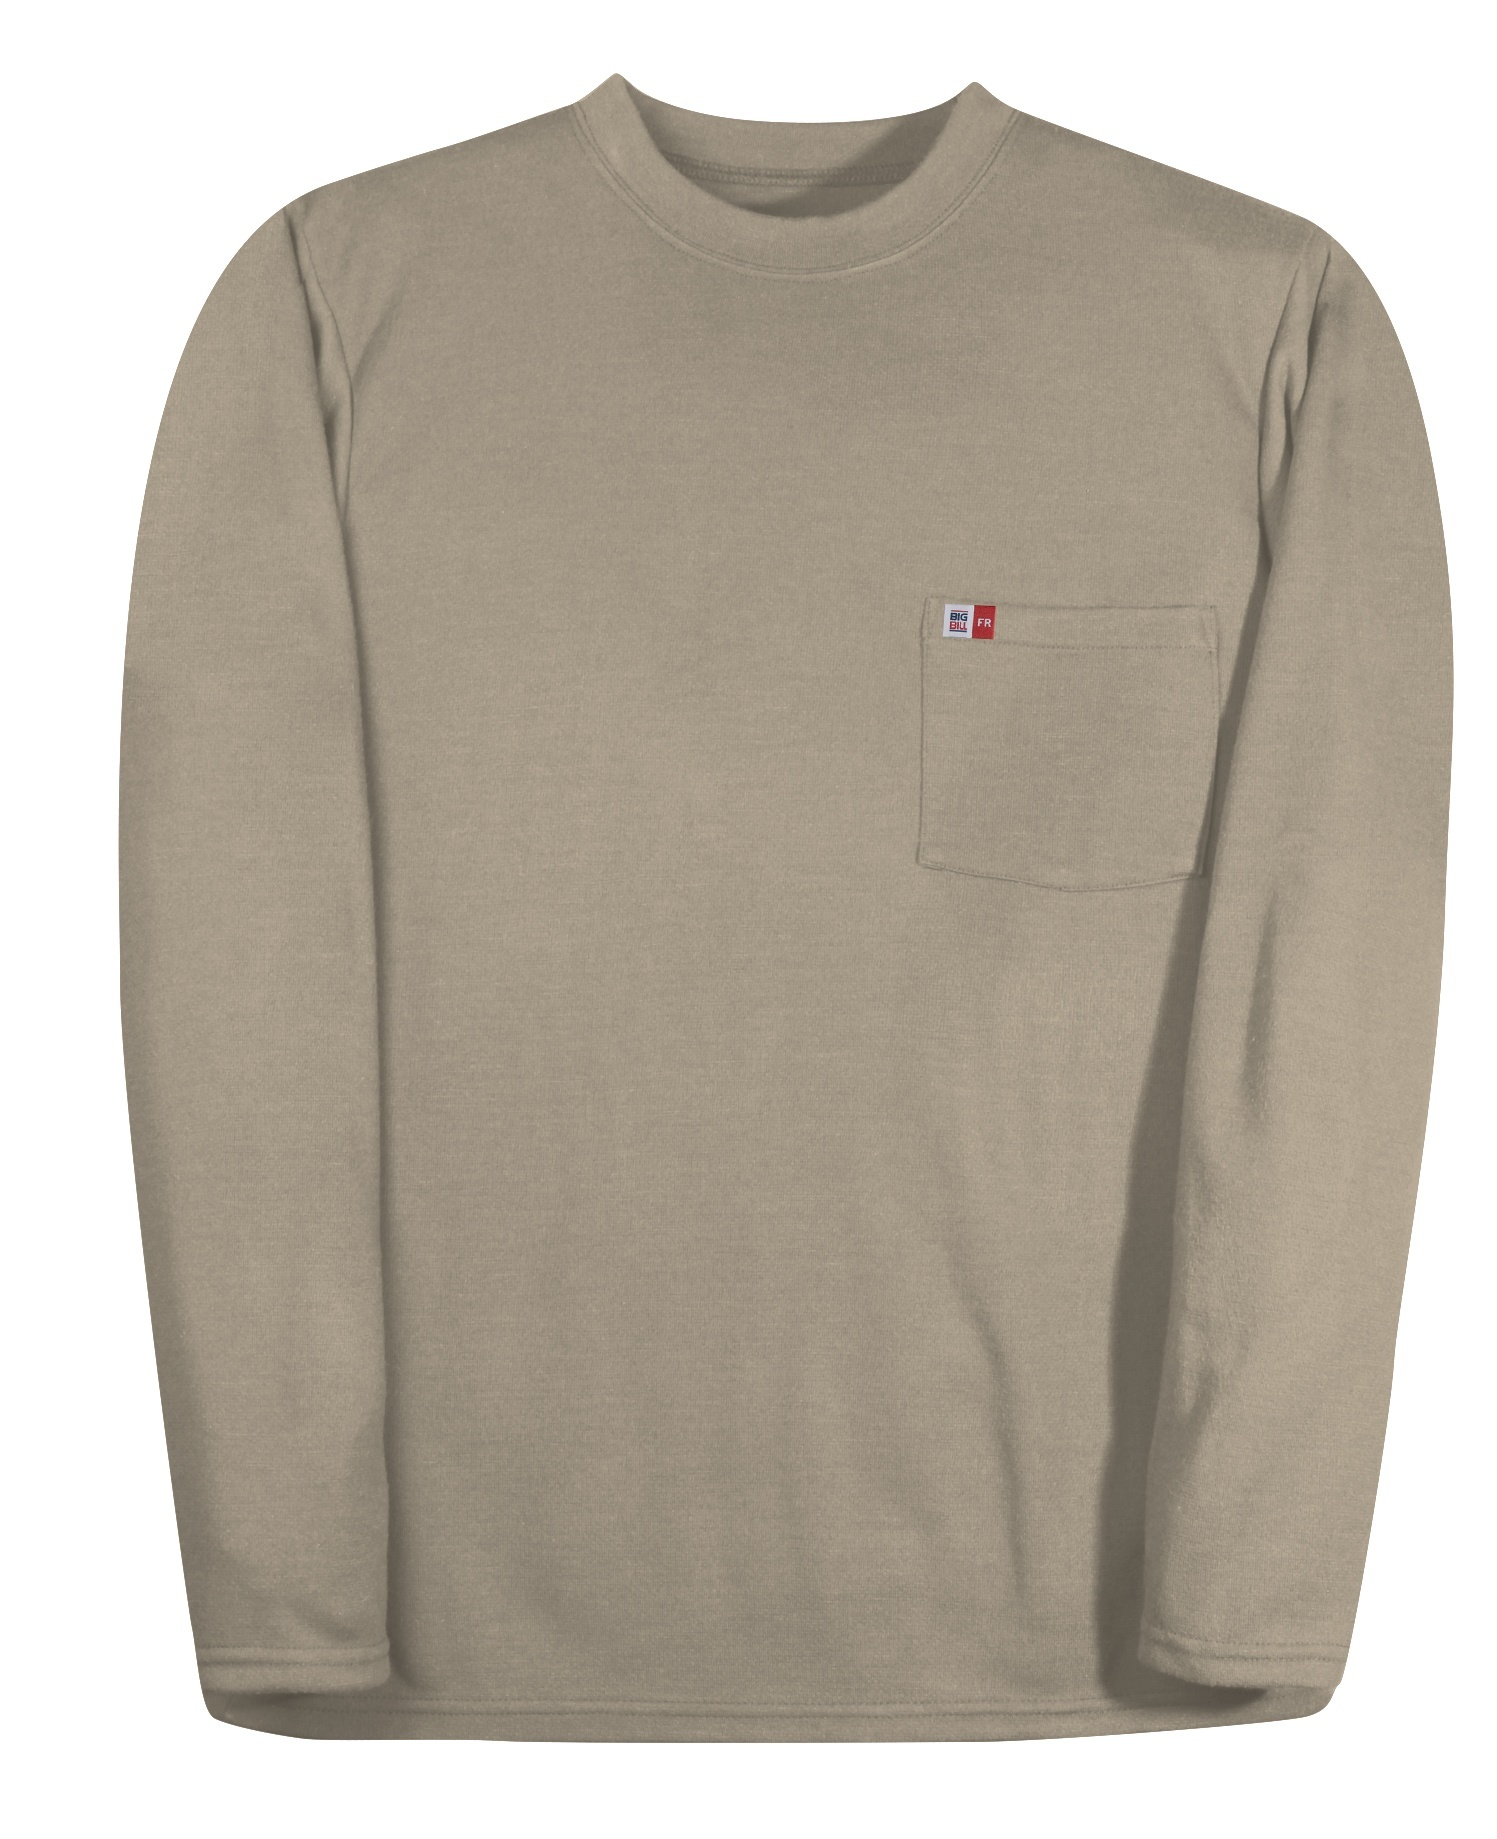 6.5 oz Innovative Textile Reliant® Interlock Long Sleeve T-Shirt-BIG BILL